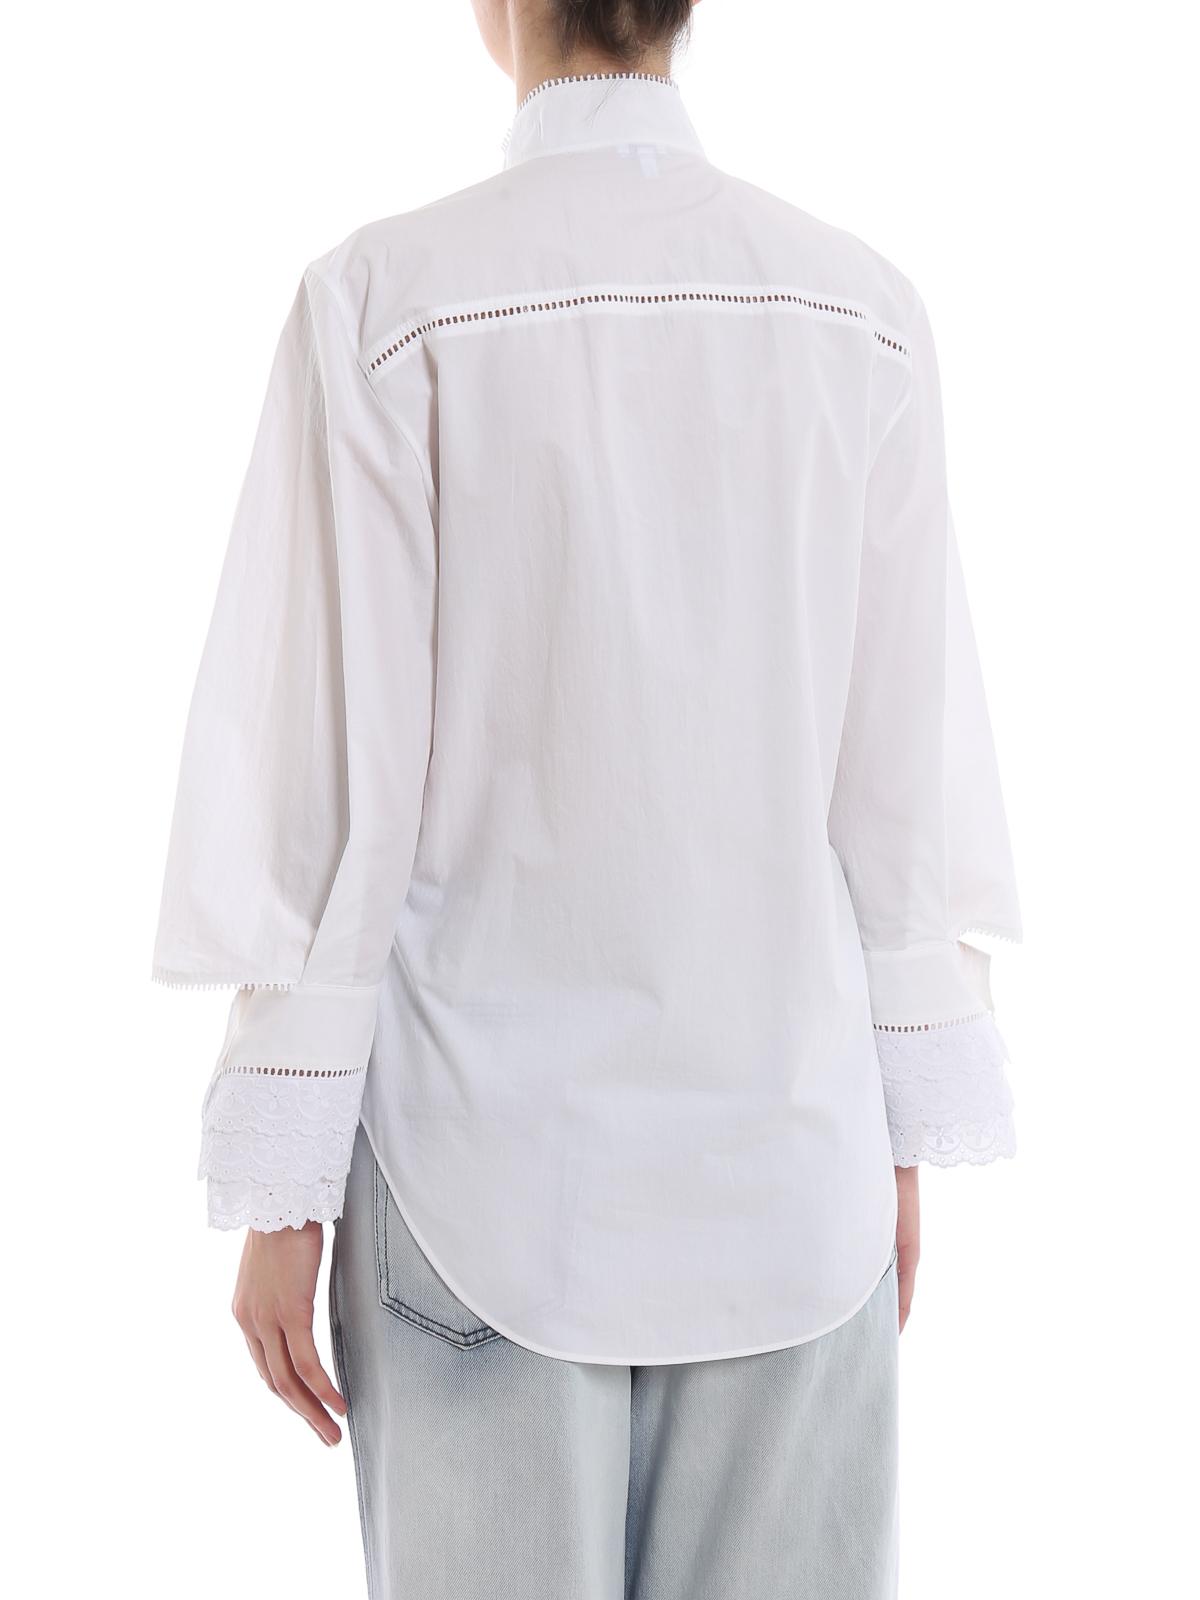 dc352341c84 Loewe - White cotton embroidered ruffle shirt - shirts - D2199810FO2100